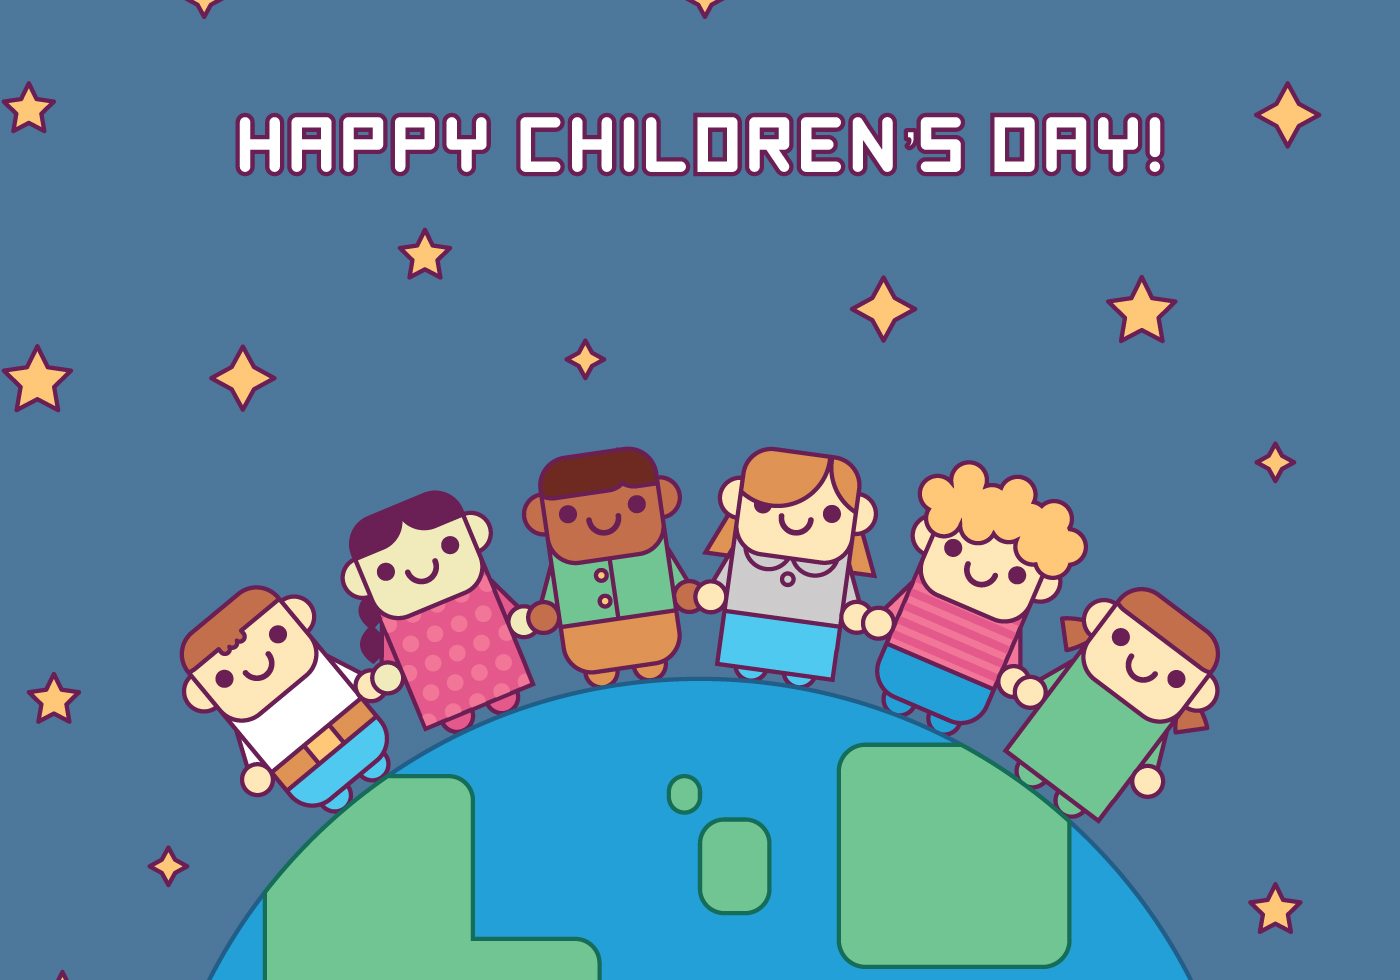 Children Outline Free Vector Art - (5060 Free Downloads)